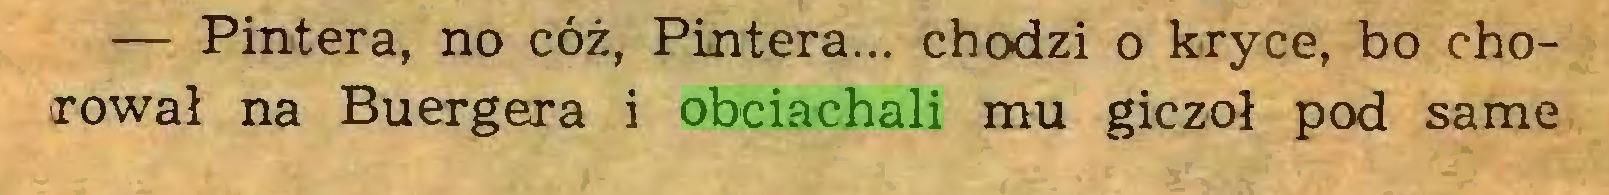 (...) — Pintera, no cóż, Pintera... chodzi o kryce, bo chorował na Buergera i obciachali mu giczoł pod same...